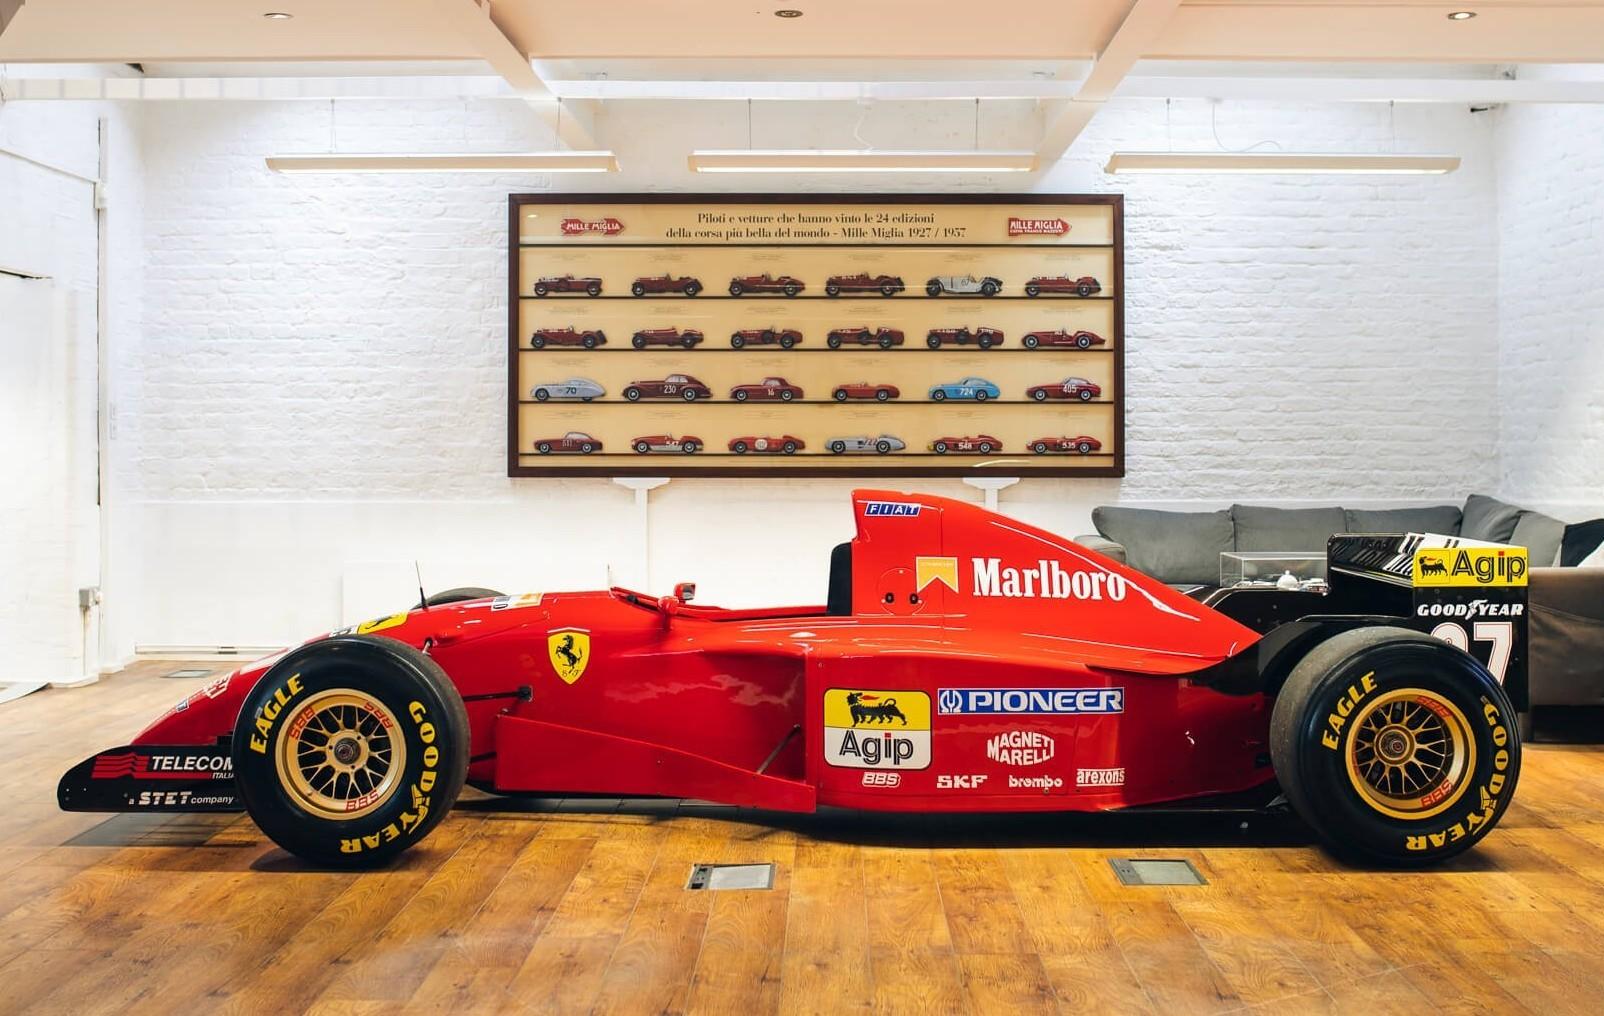 A final de 1995, Schumacher probó esta misma unidad.